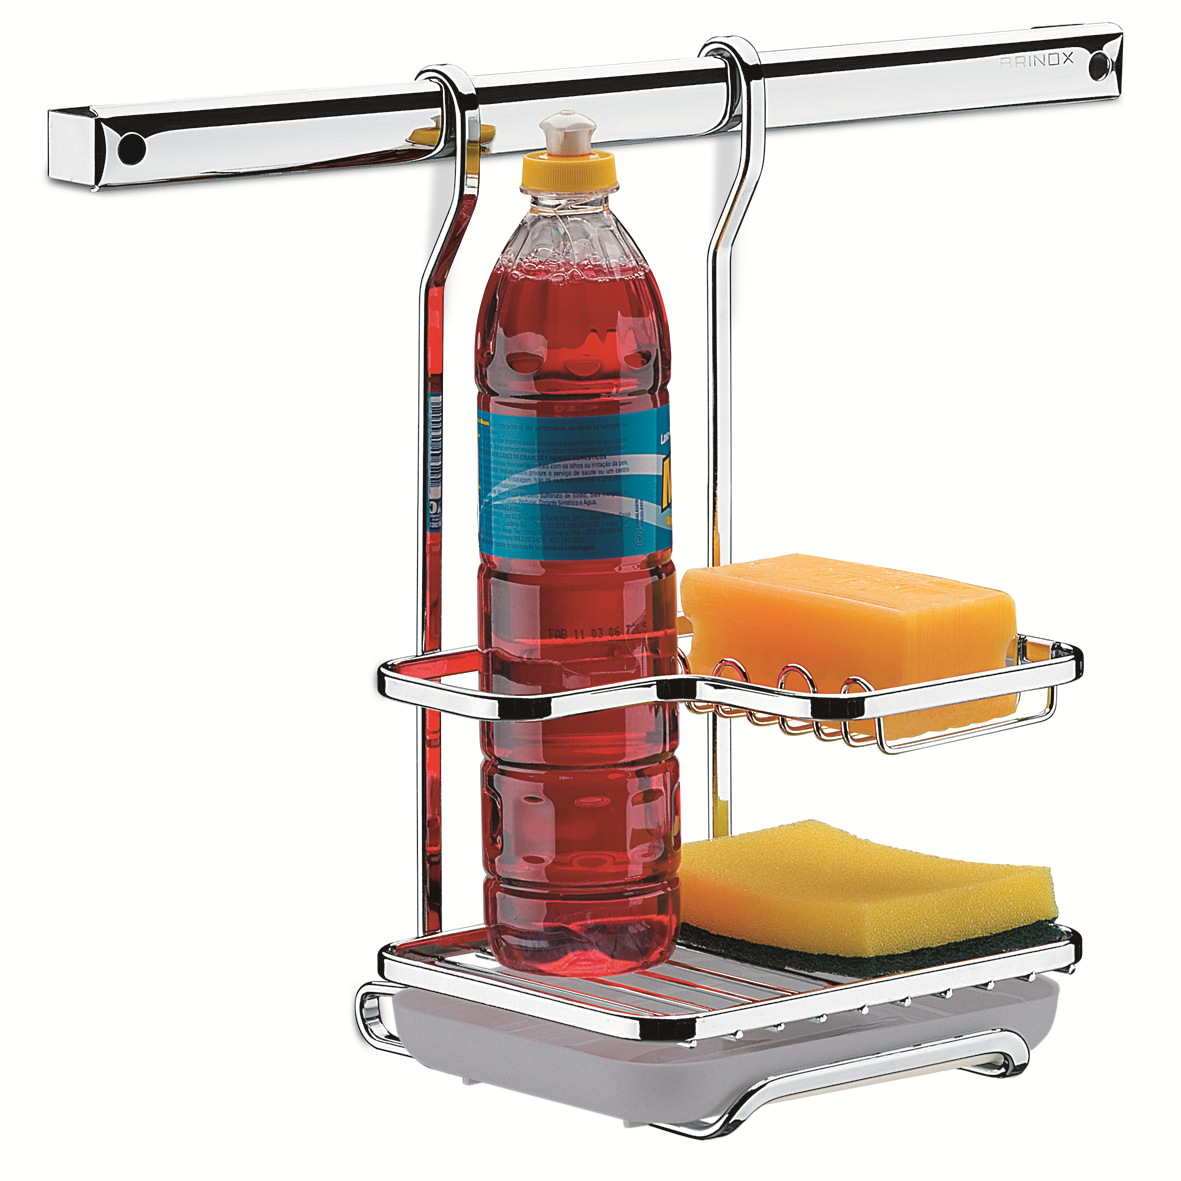 Kit Organizador de Pia Multiuso 2020012 - Brinox